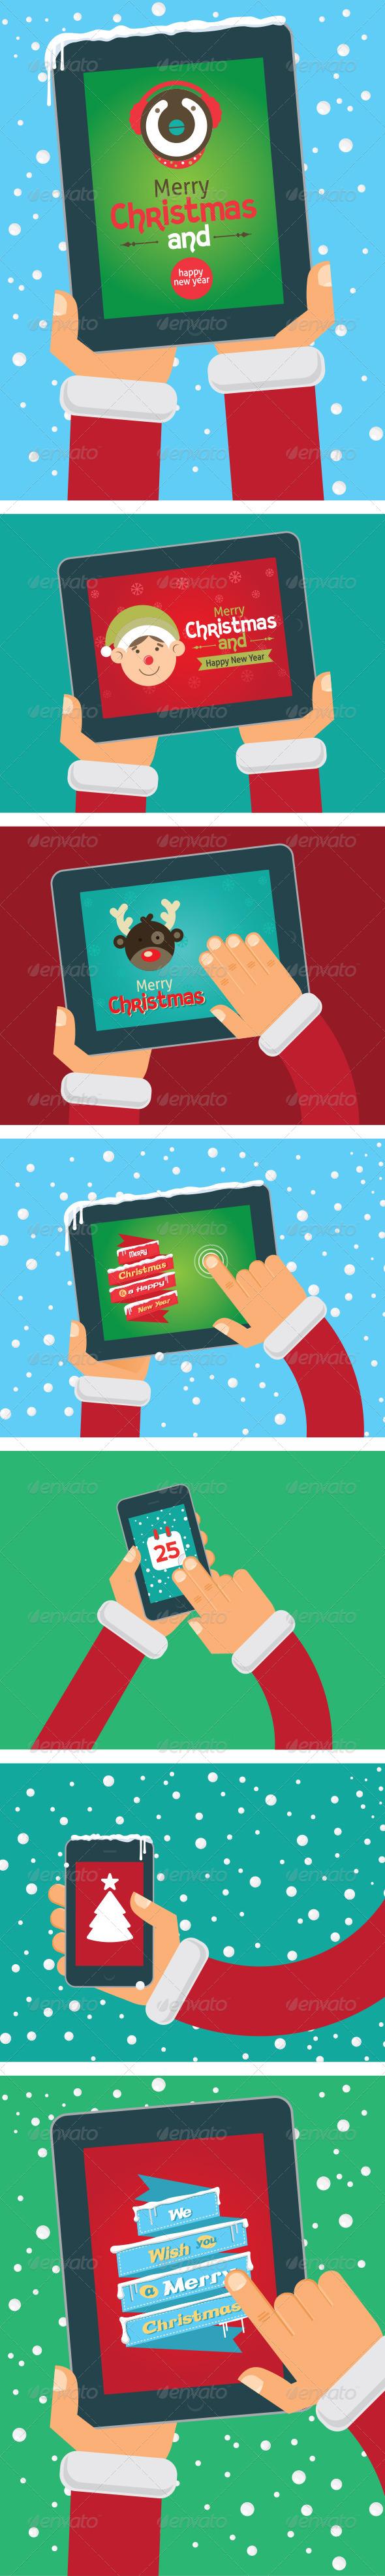 Vector Christmas Cards on Tablet and Phone - Christmas Seasons/Holidays